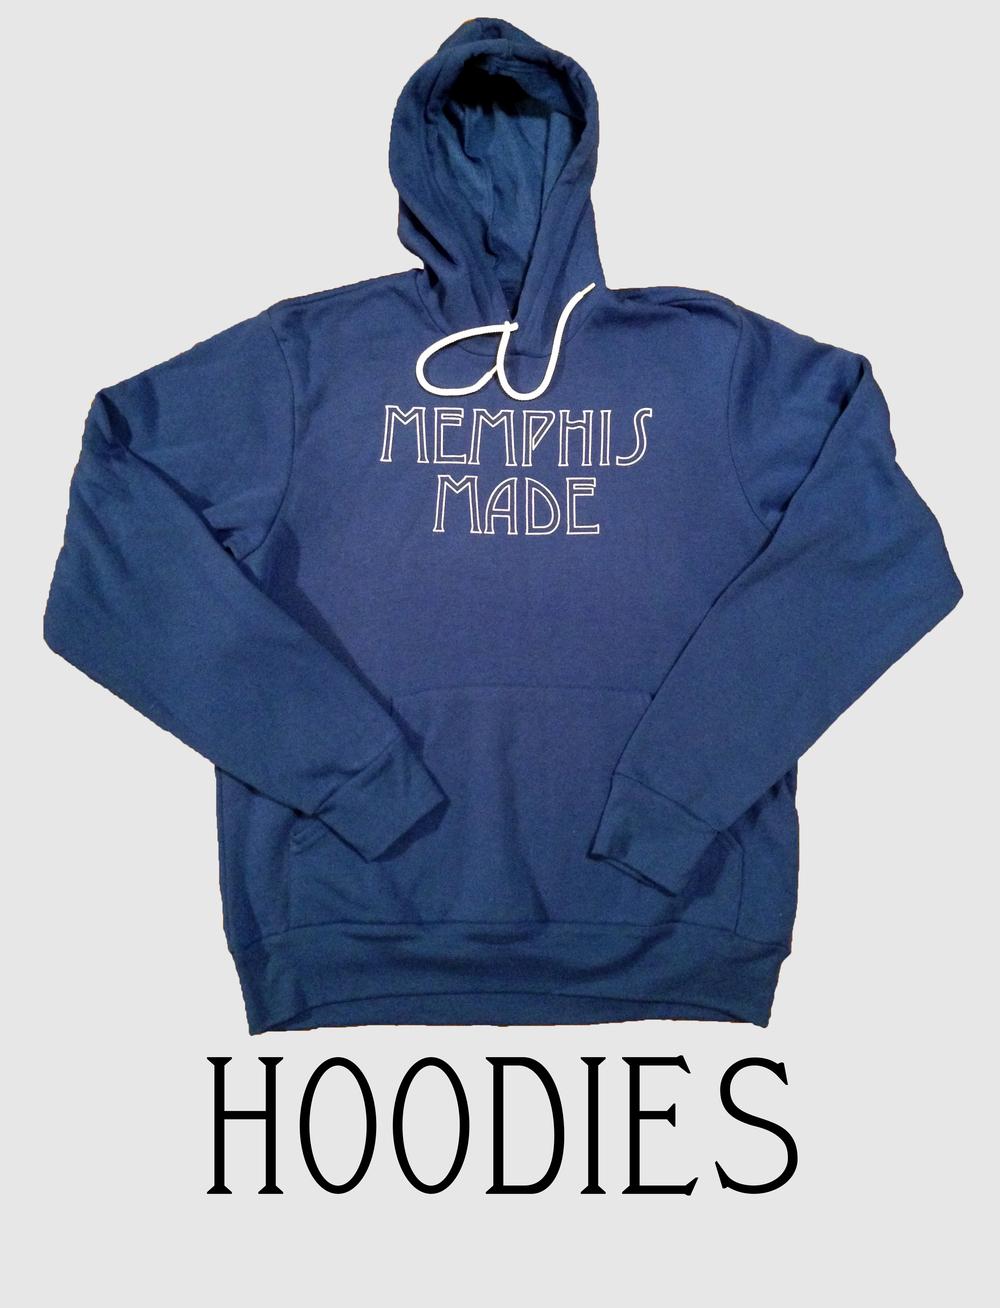 memphismade-hoodies.jpg